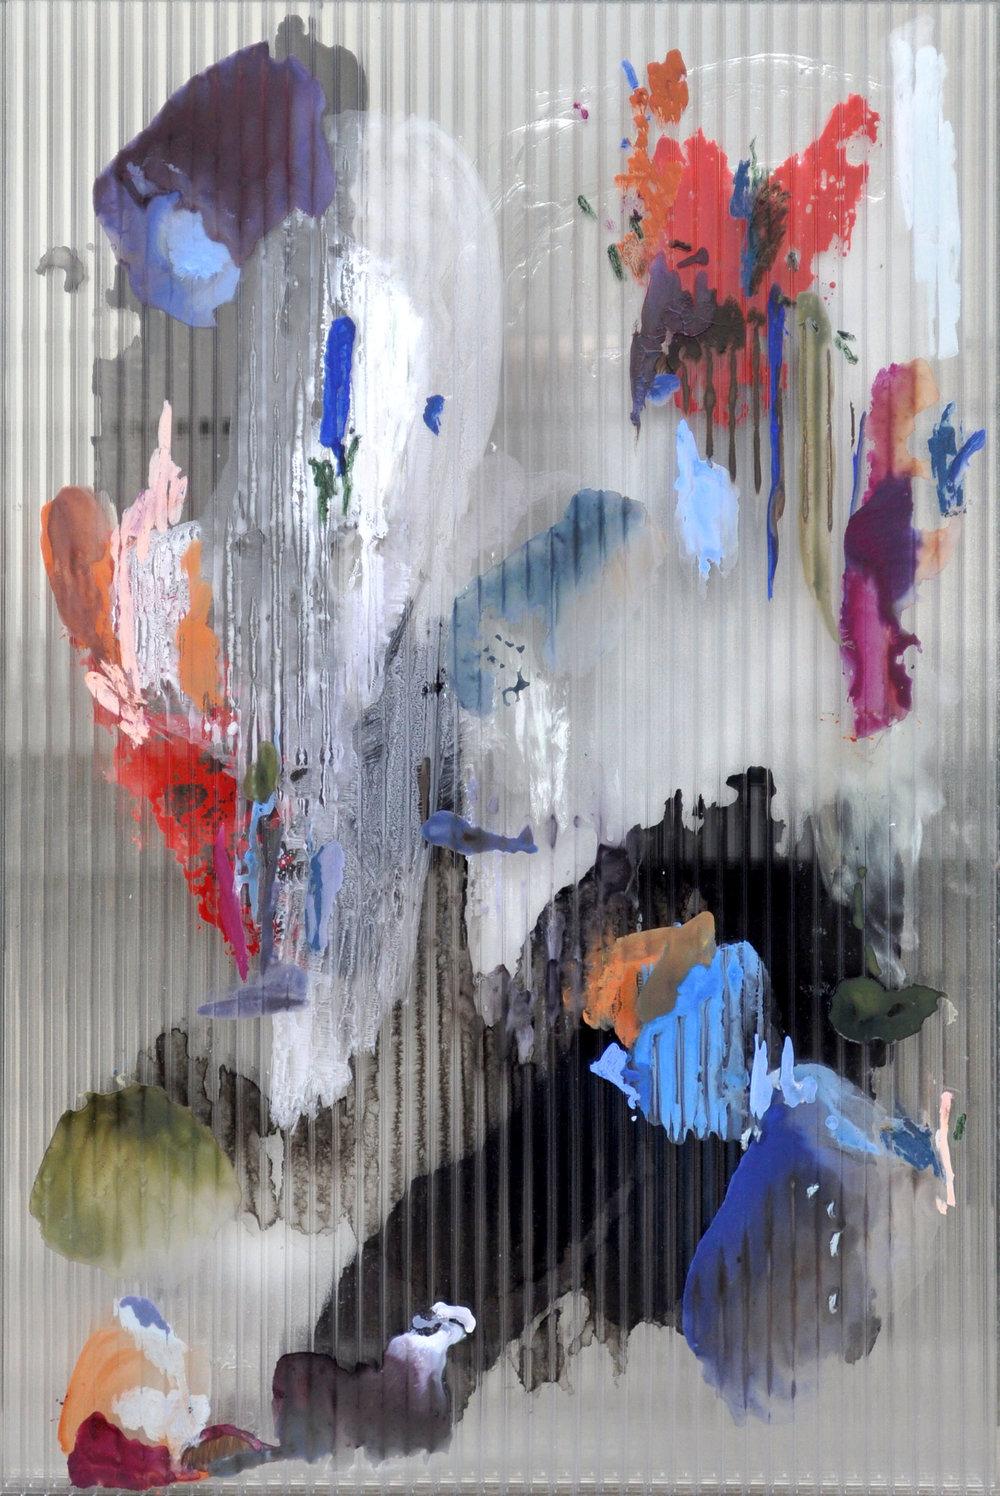 Chaos 2 , 2017 gouache, ink, acrylic, oil, mastic on polycarbonate, mirror, aluminium frame 67 x 44,5 x 2,5 cm